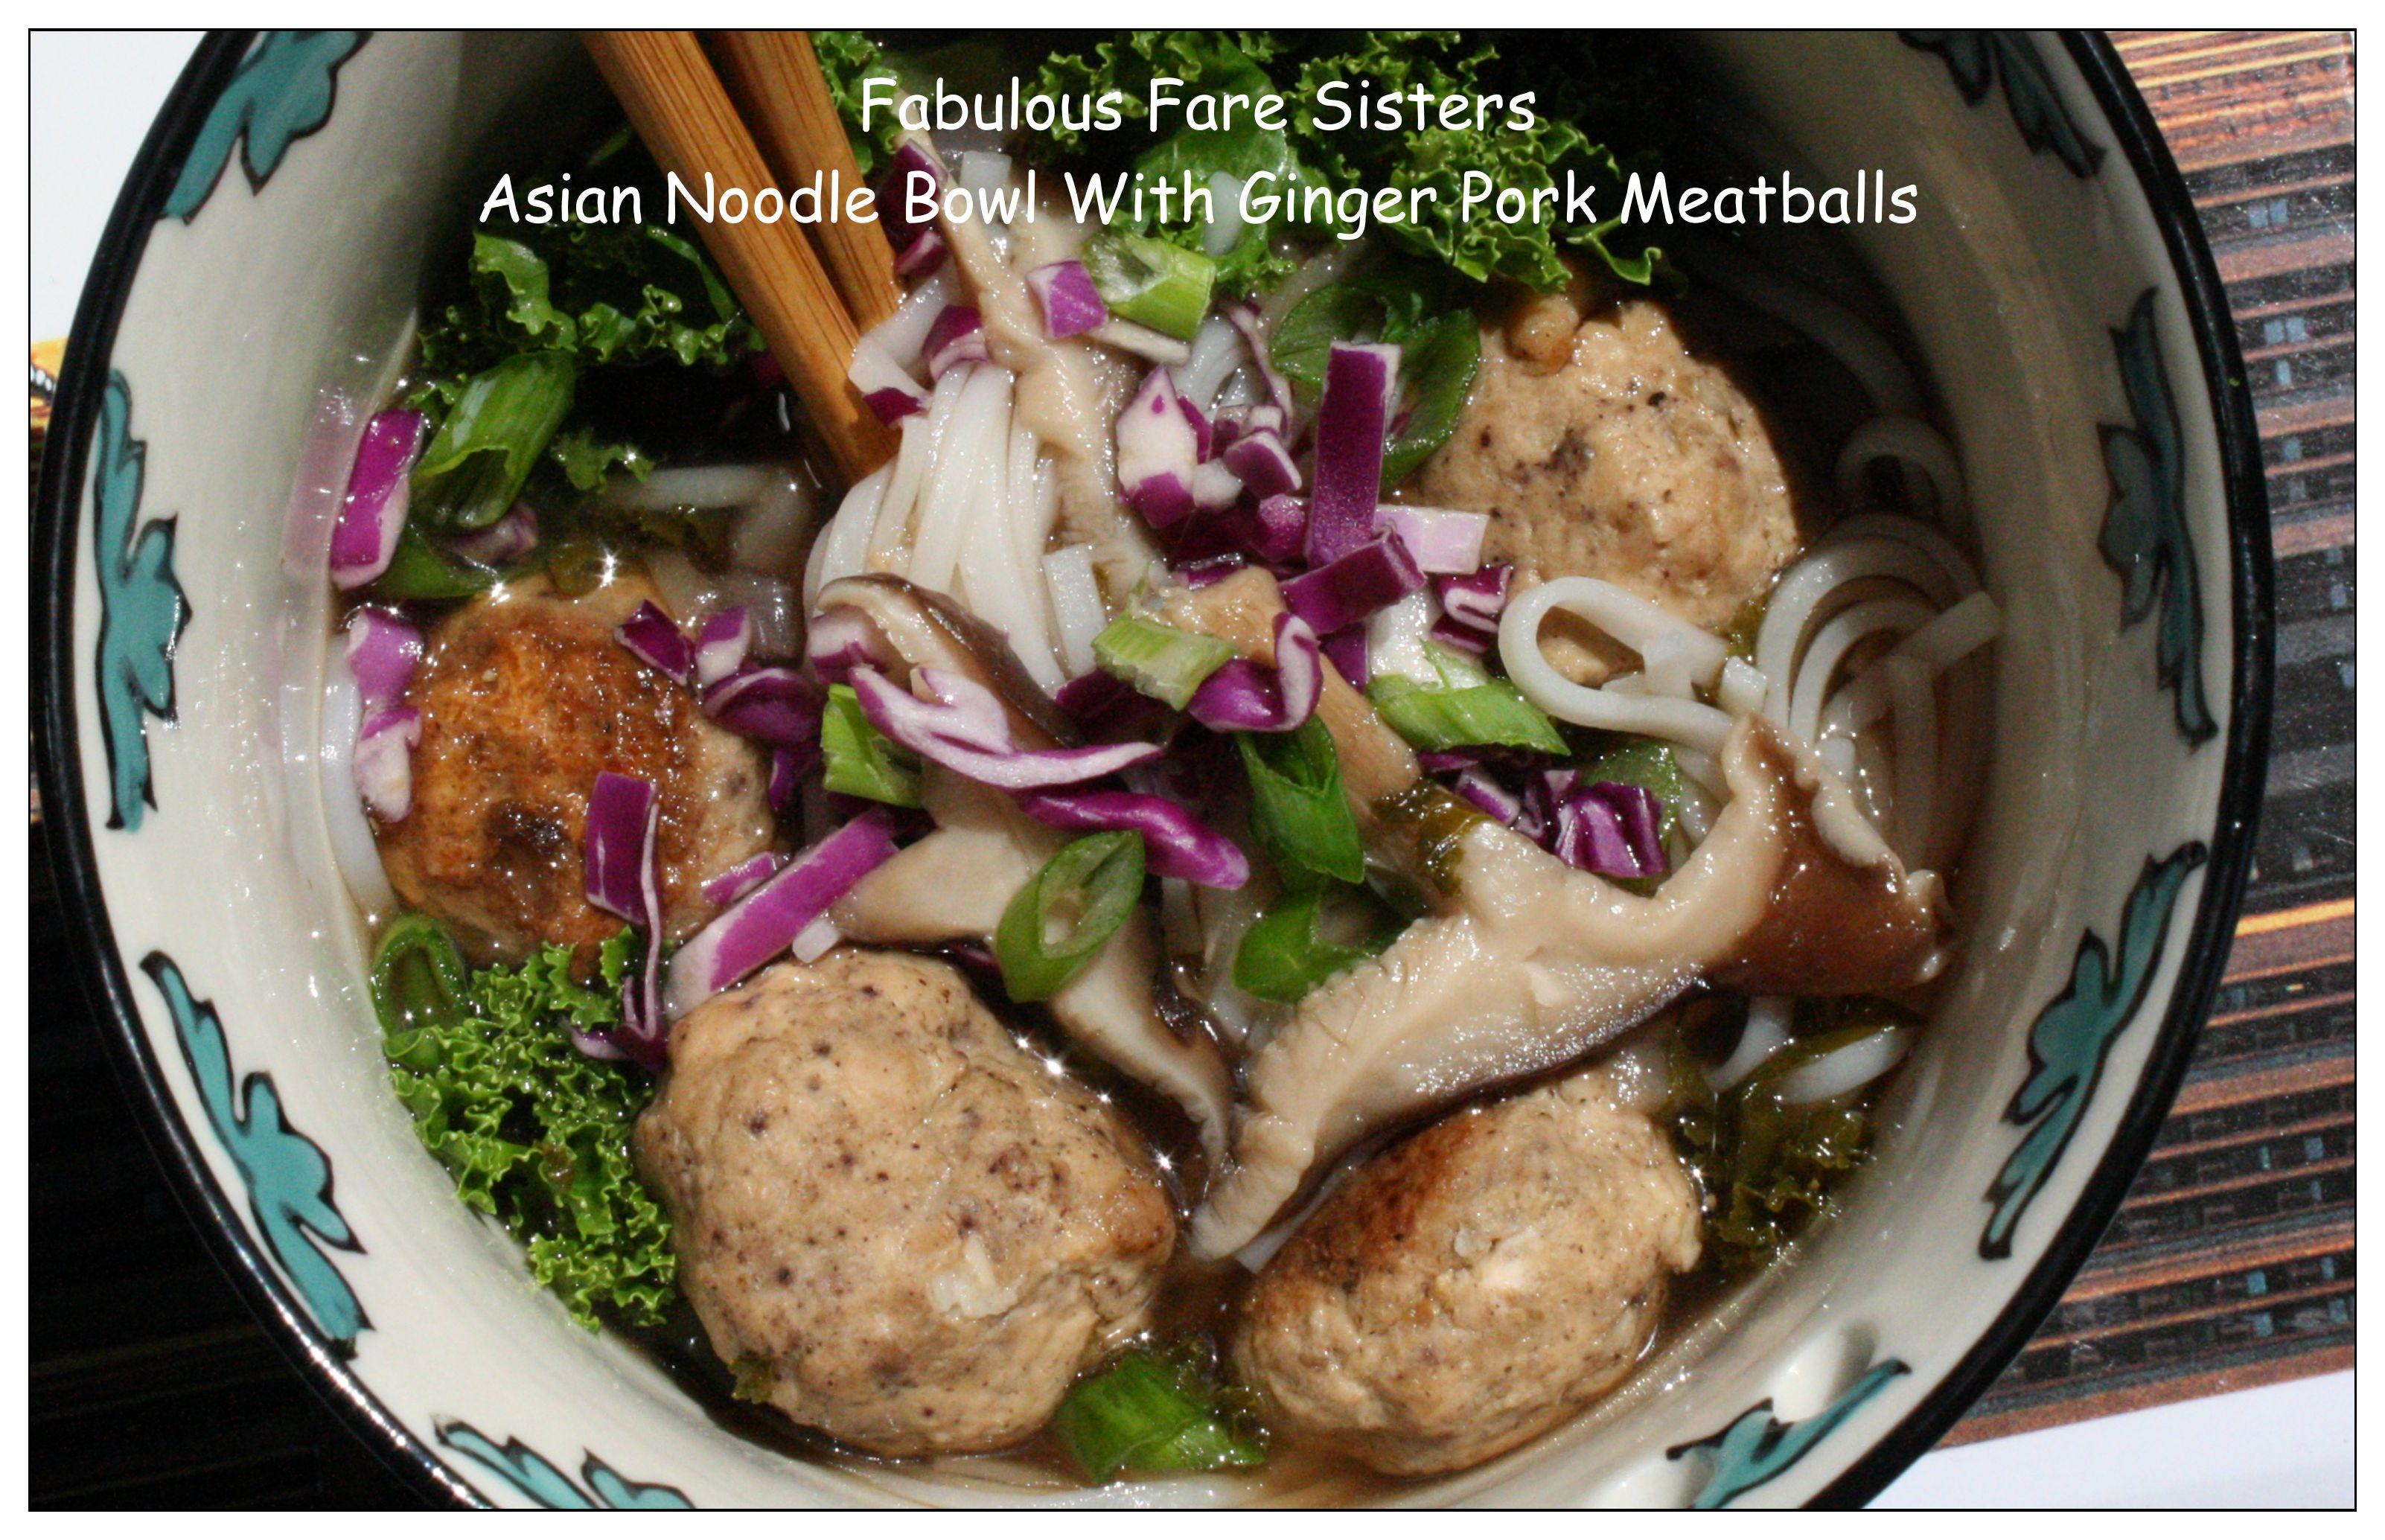 Asian Noodle Bowl With Ginger Pork Meatballs